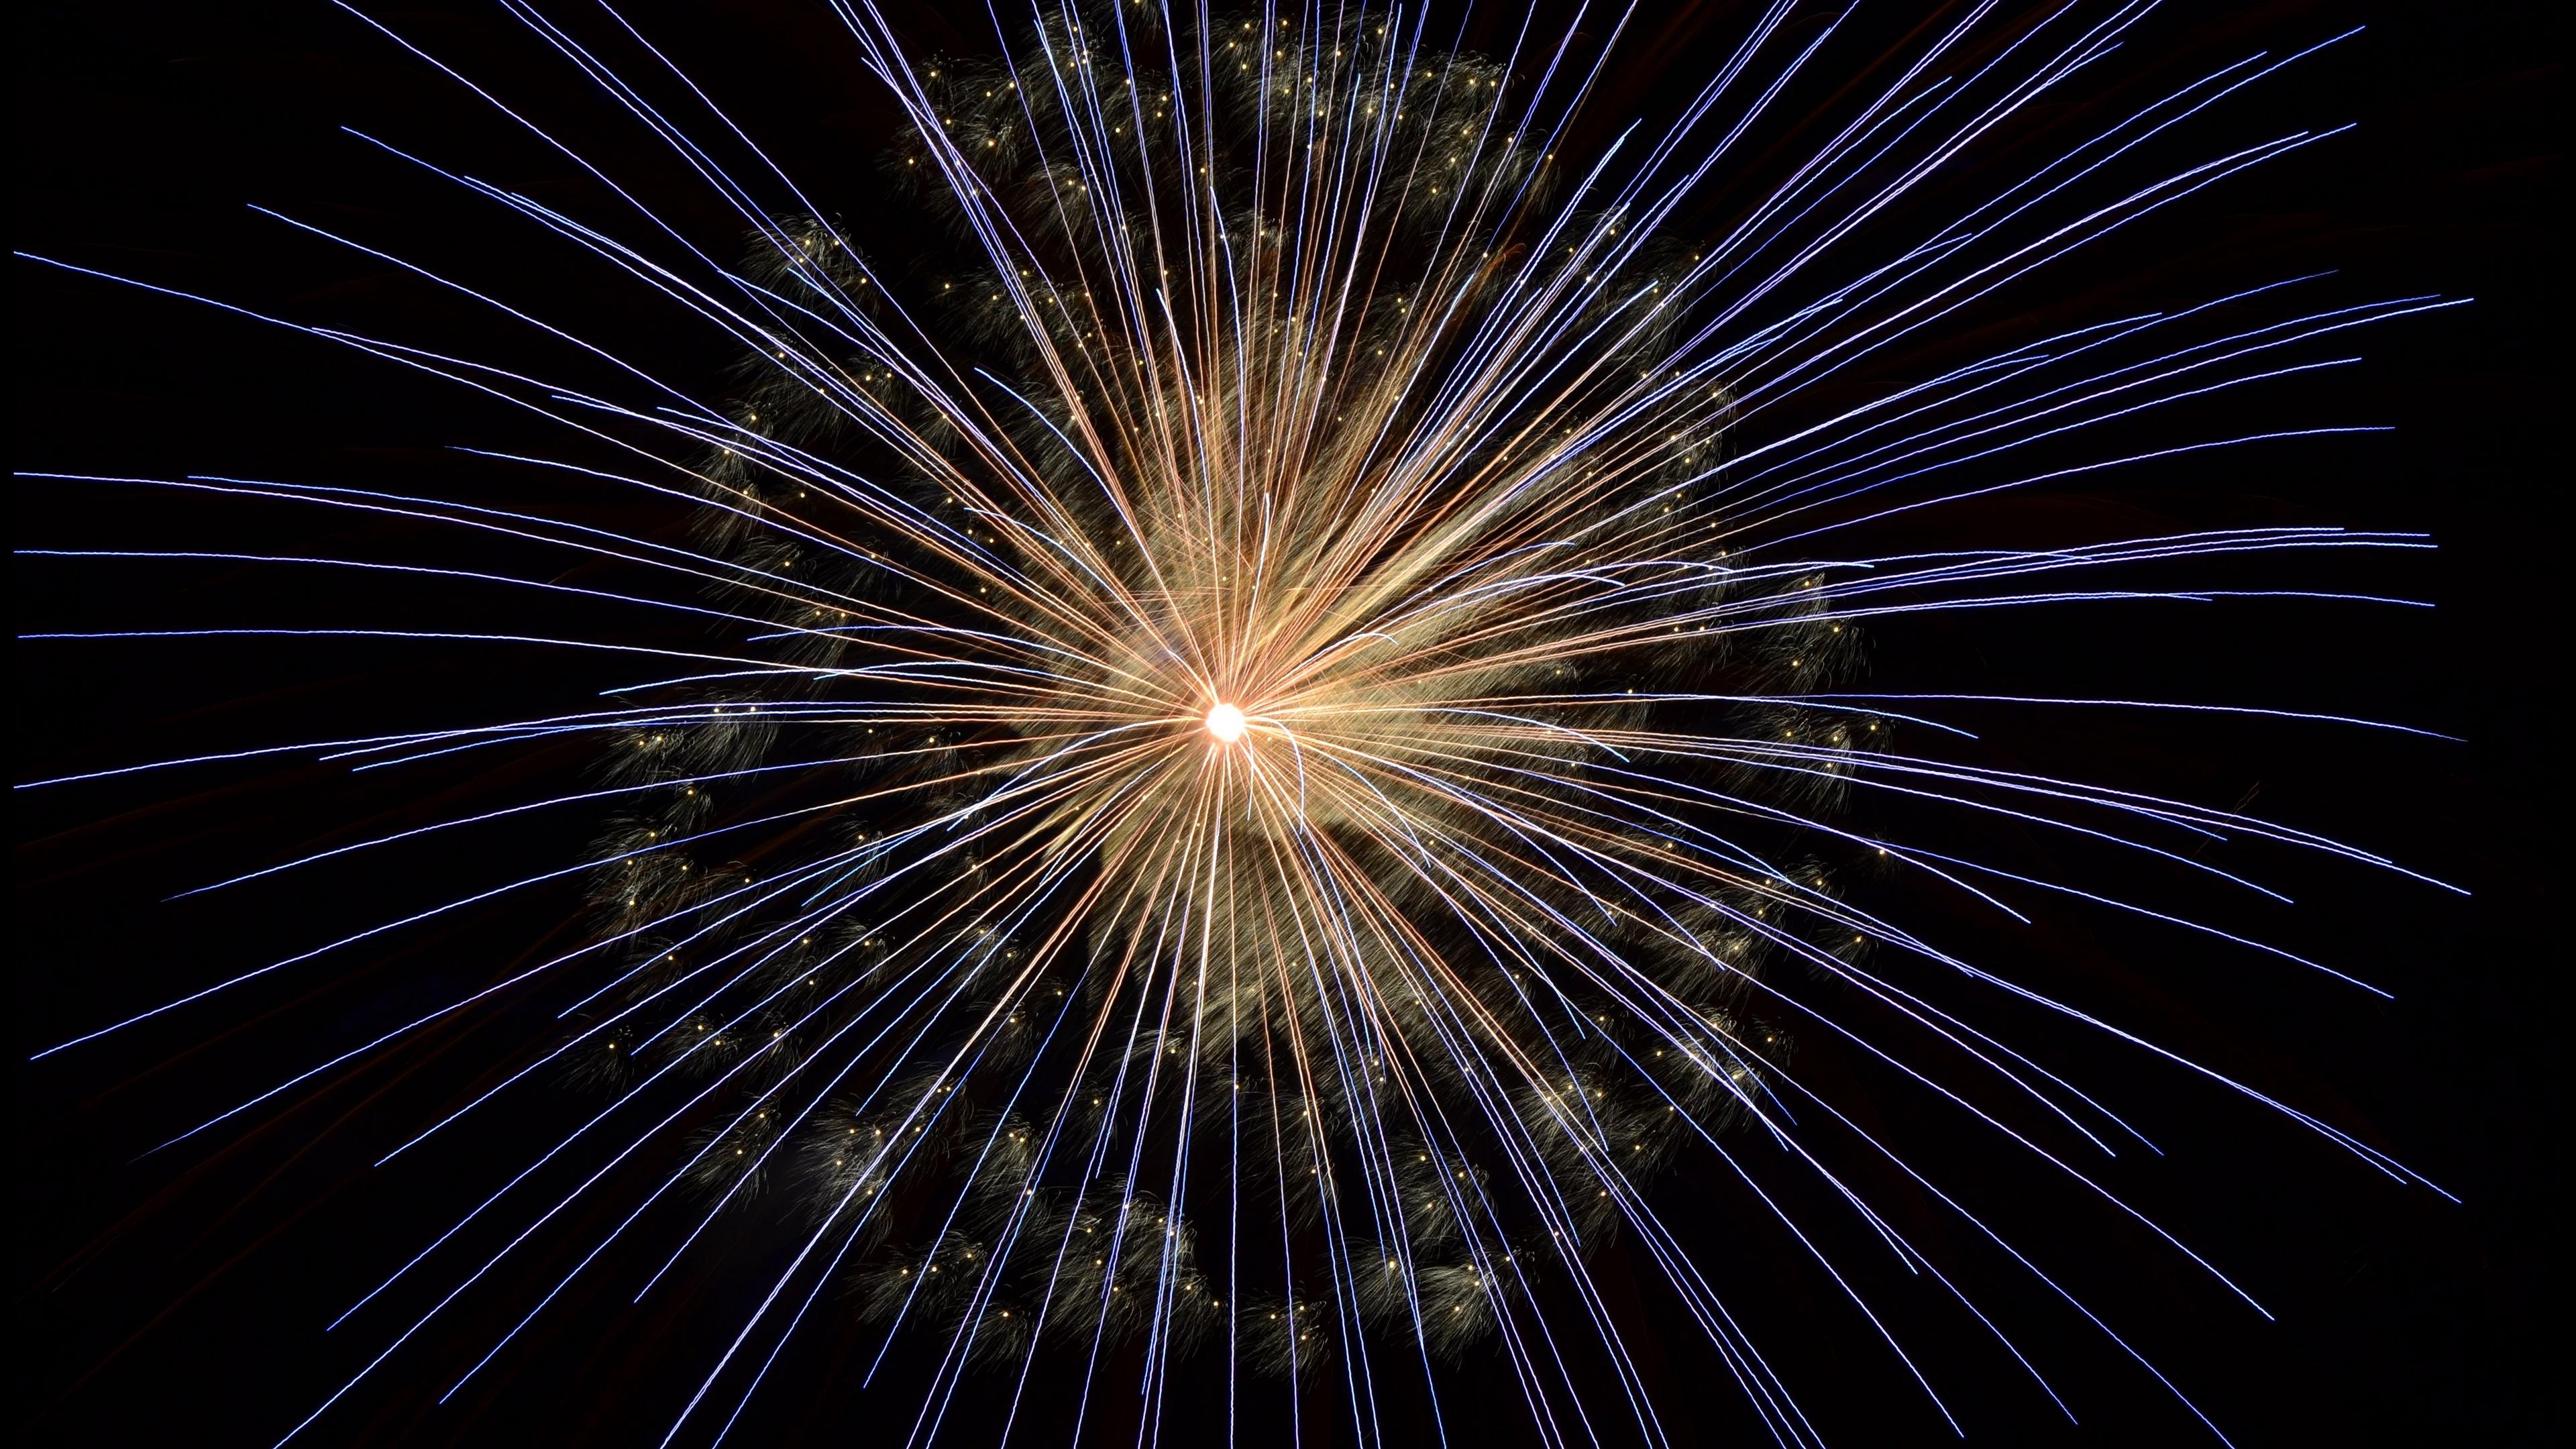 banger fireworks celebration 4k 1538344921 - banger, fireworks, celebration 4k - Fireworks, Celebration, banger